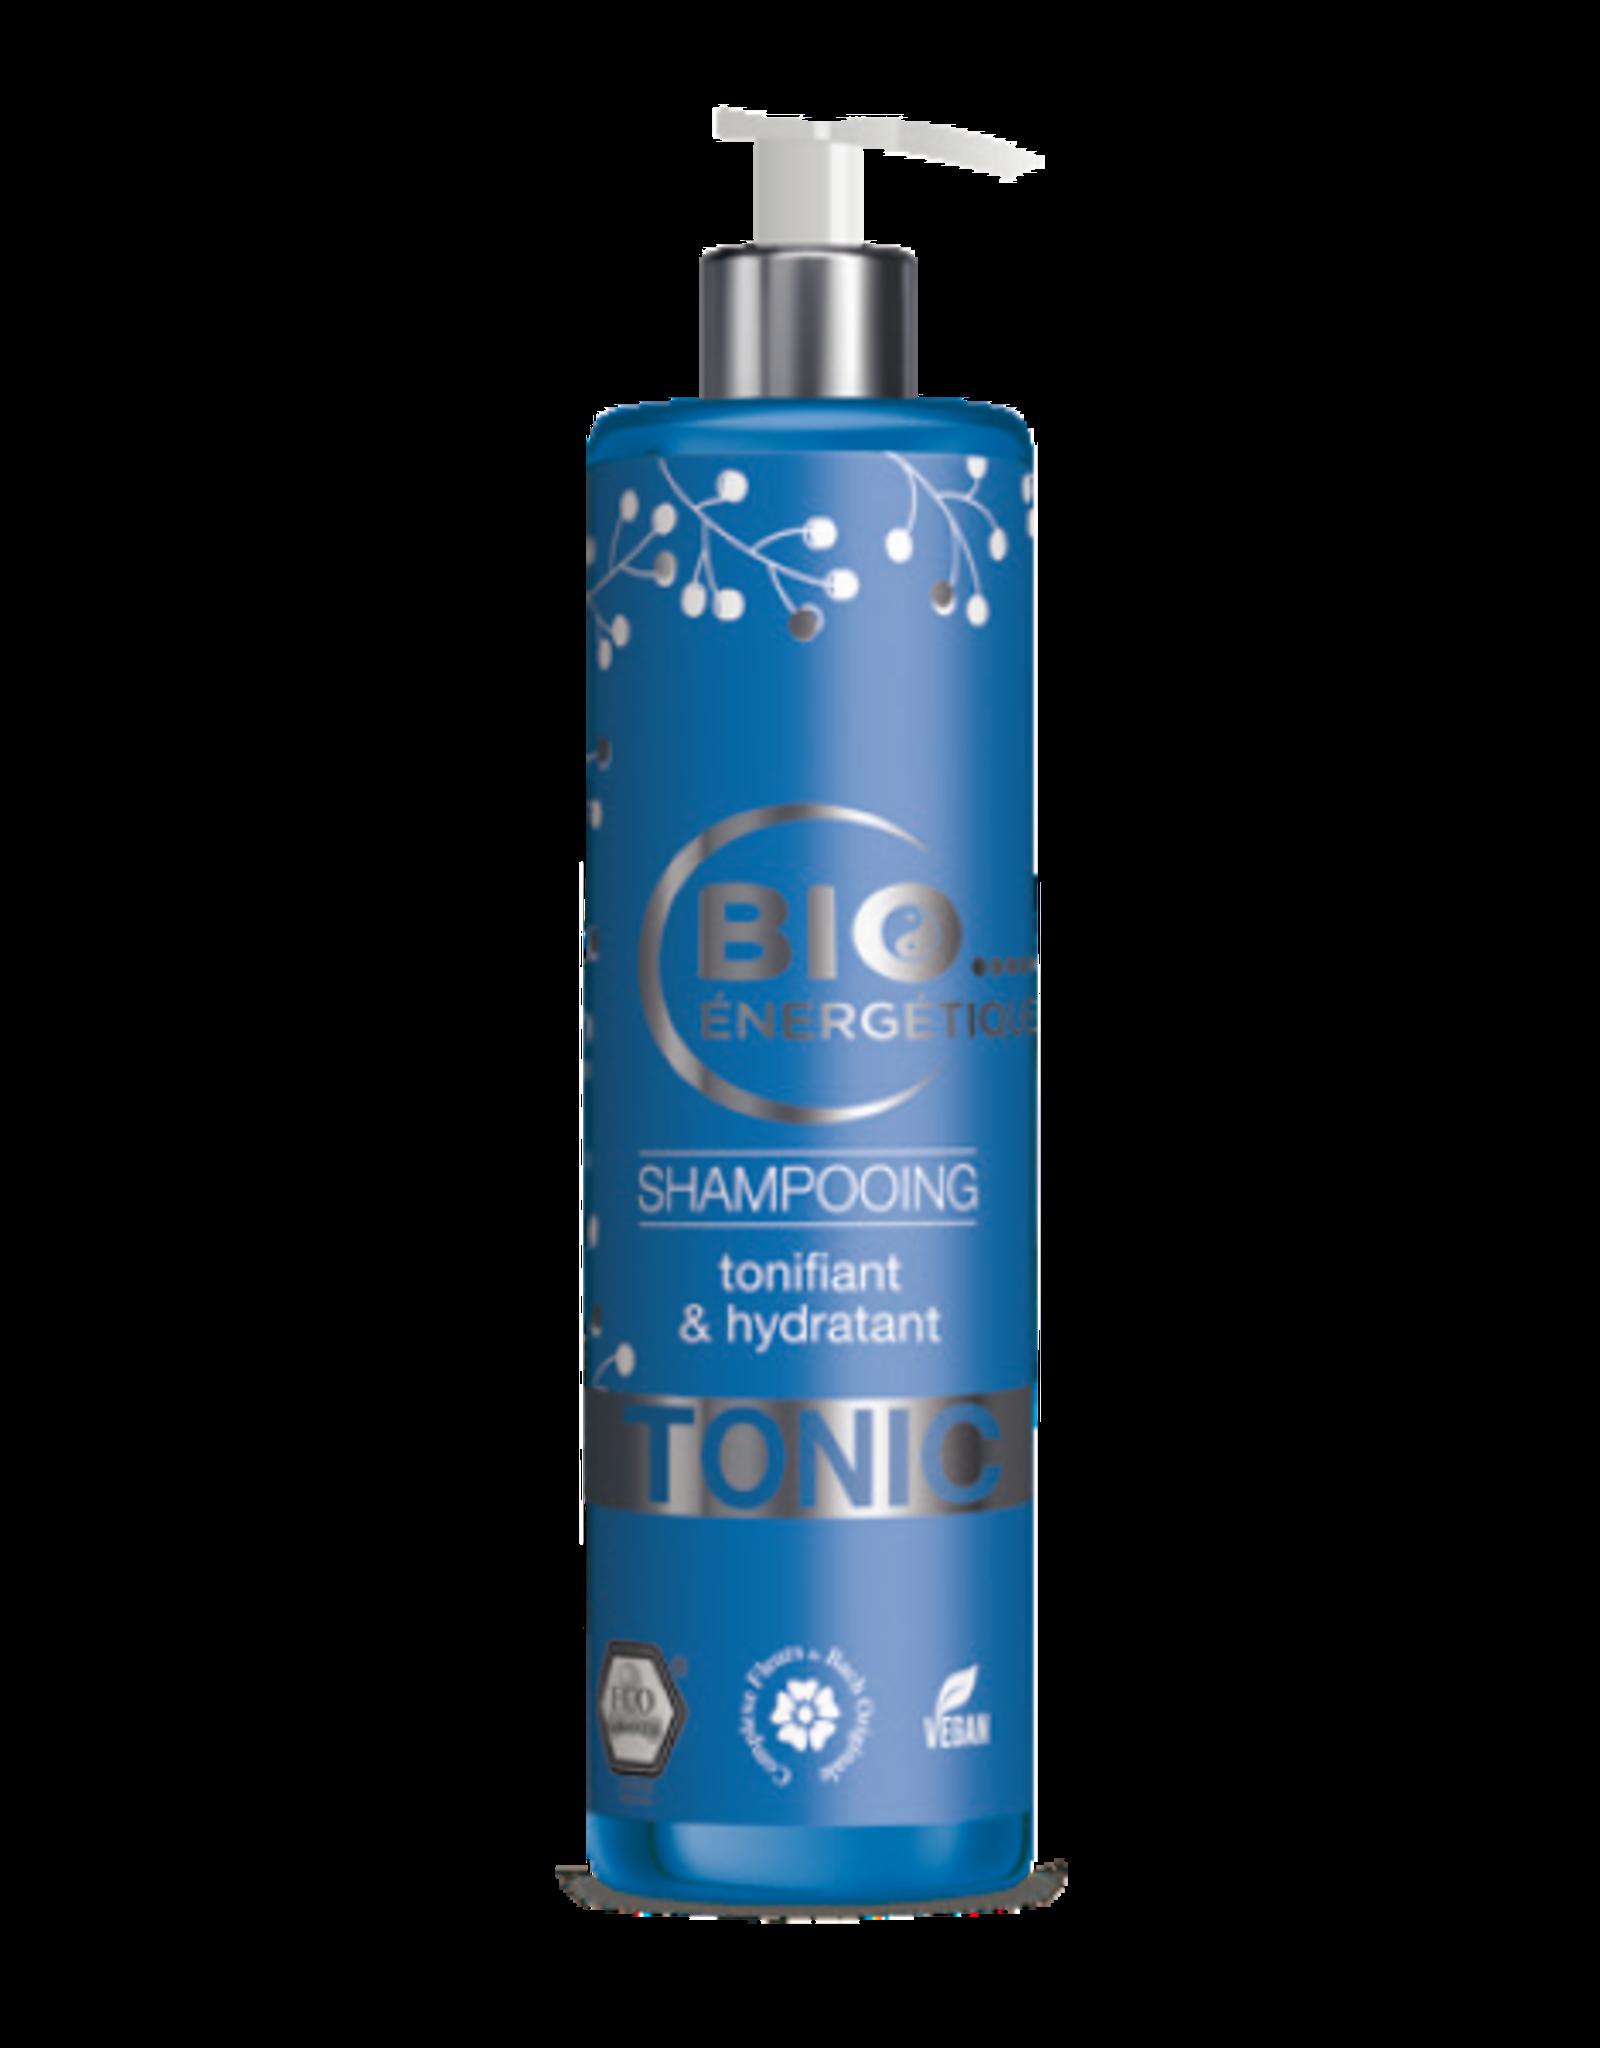 Bio Hair TONIC Shampoo / Toning & moisturizing